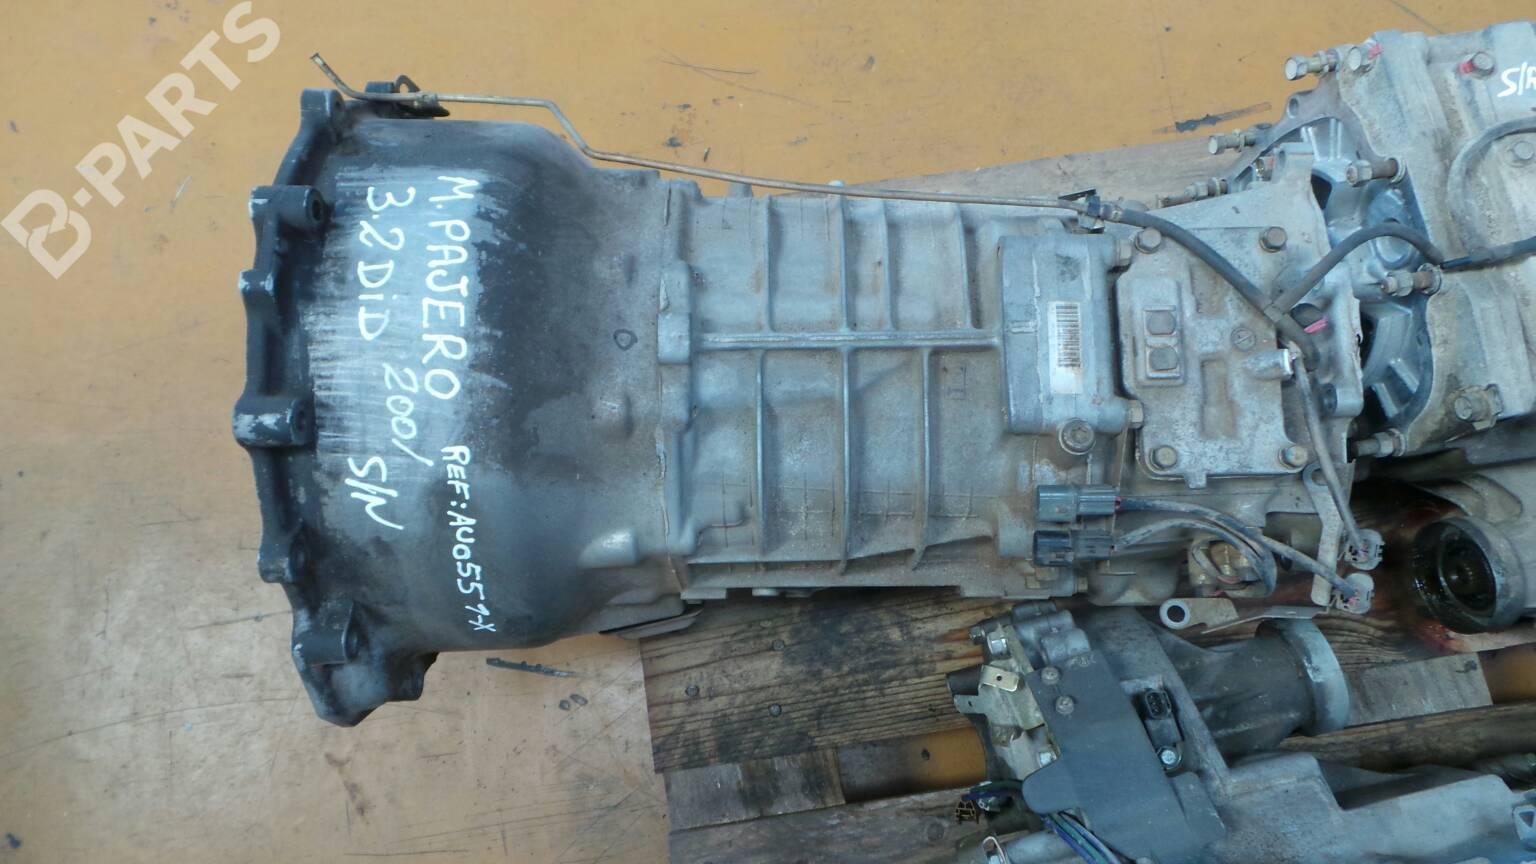 Manual Gearbox Mitsubishi Pajero Iii V7 W V6 32 Di D V68w 27778 Diagram V5m316x Au0551